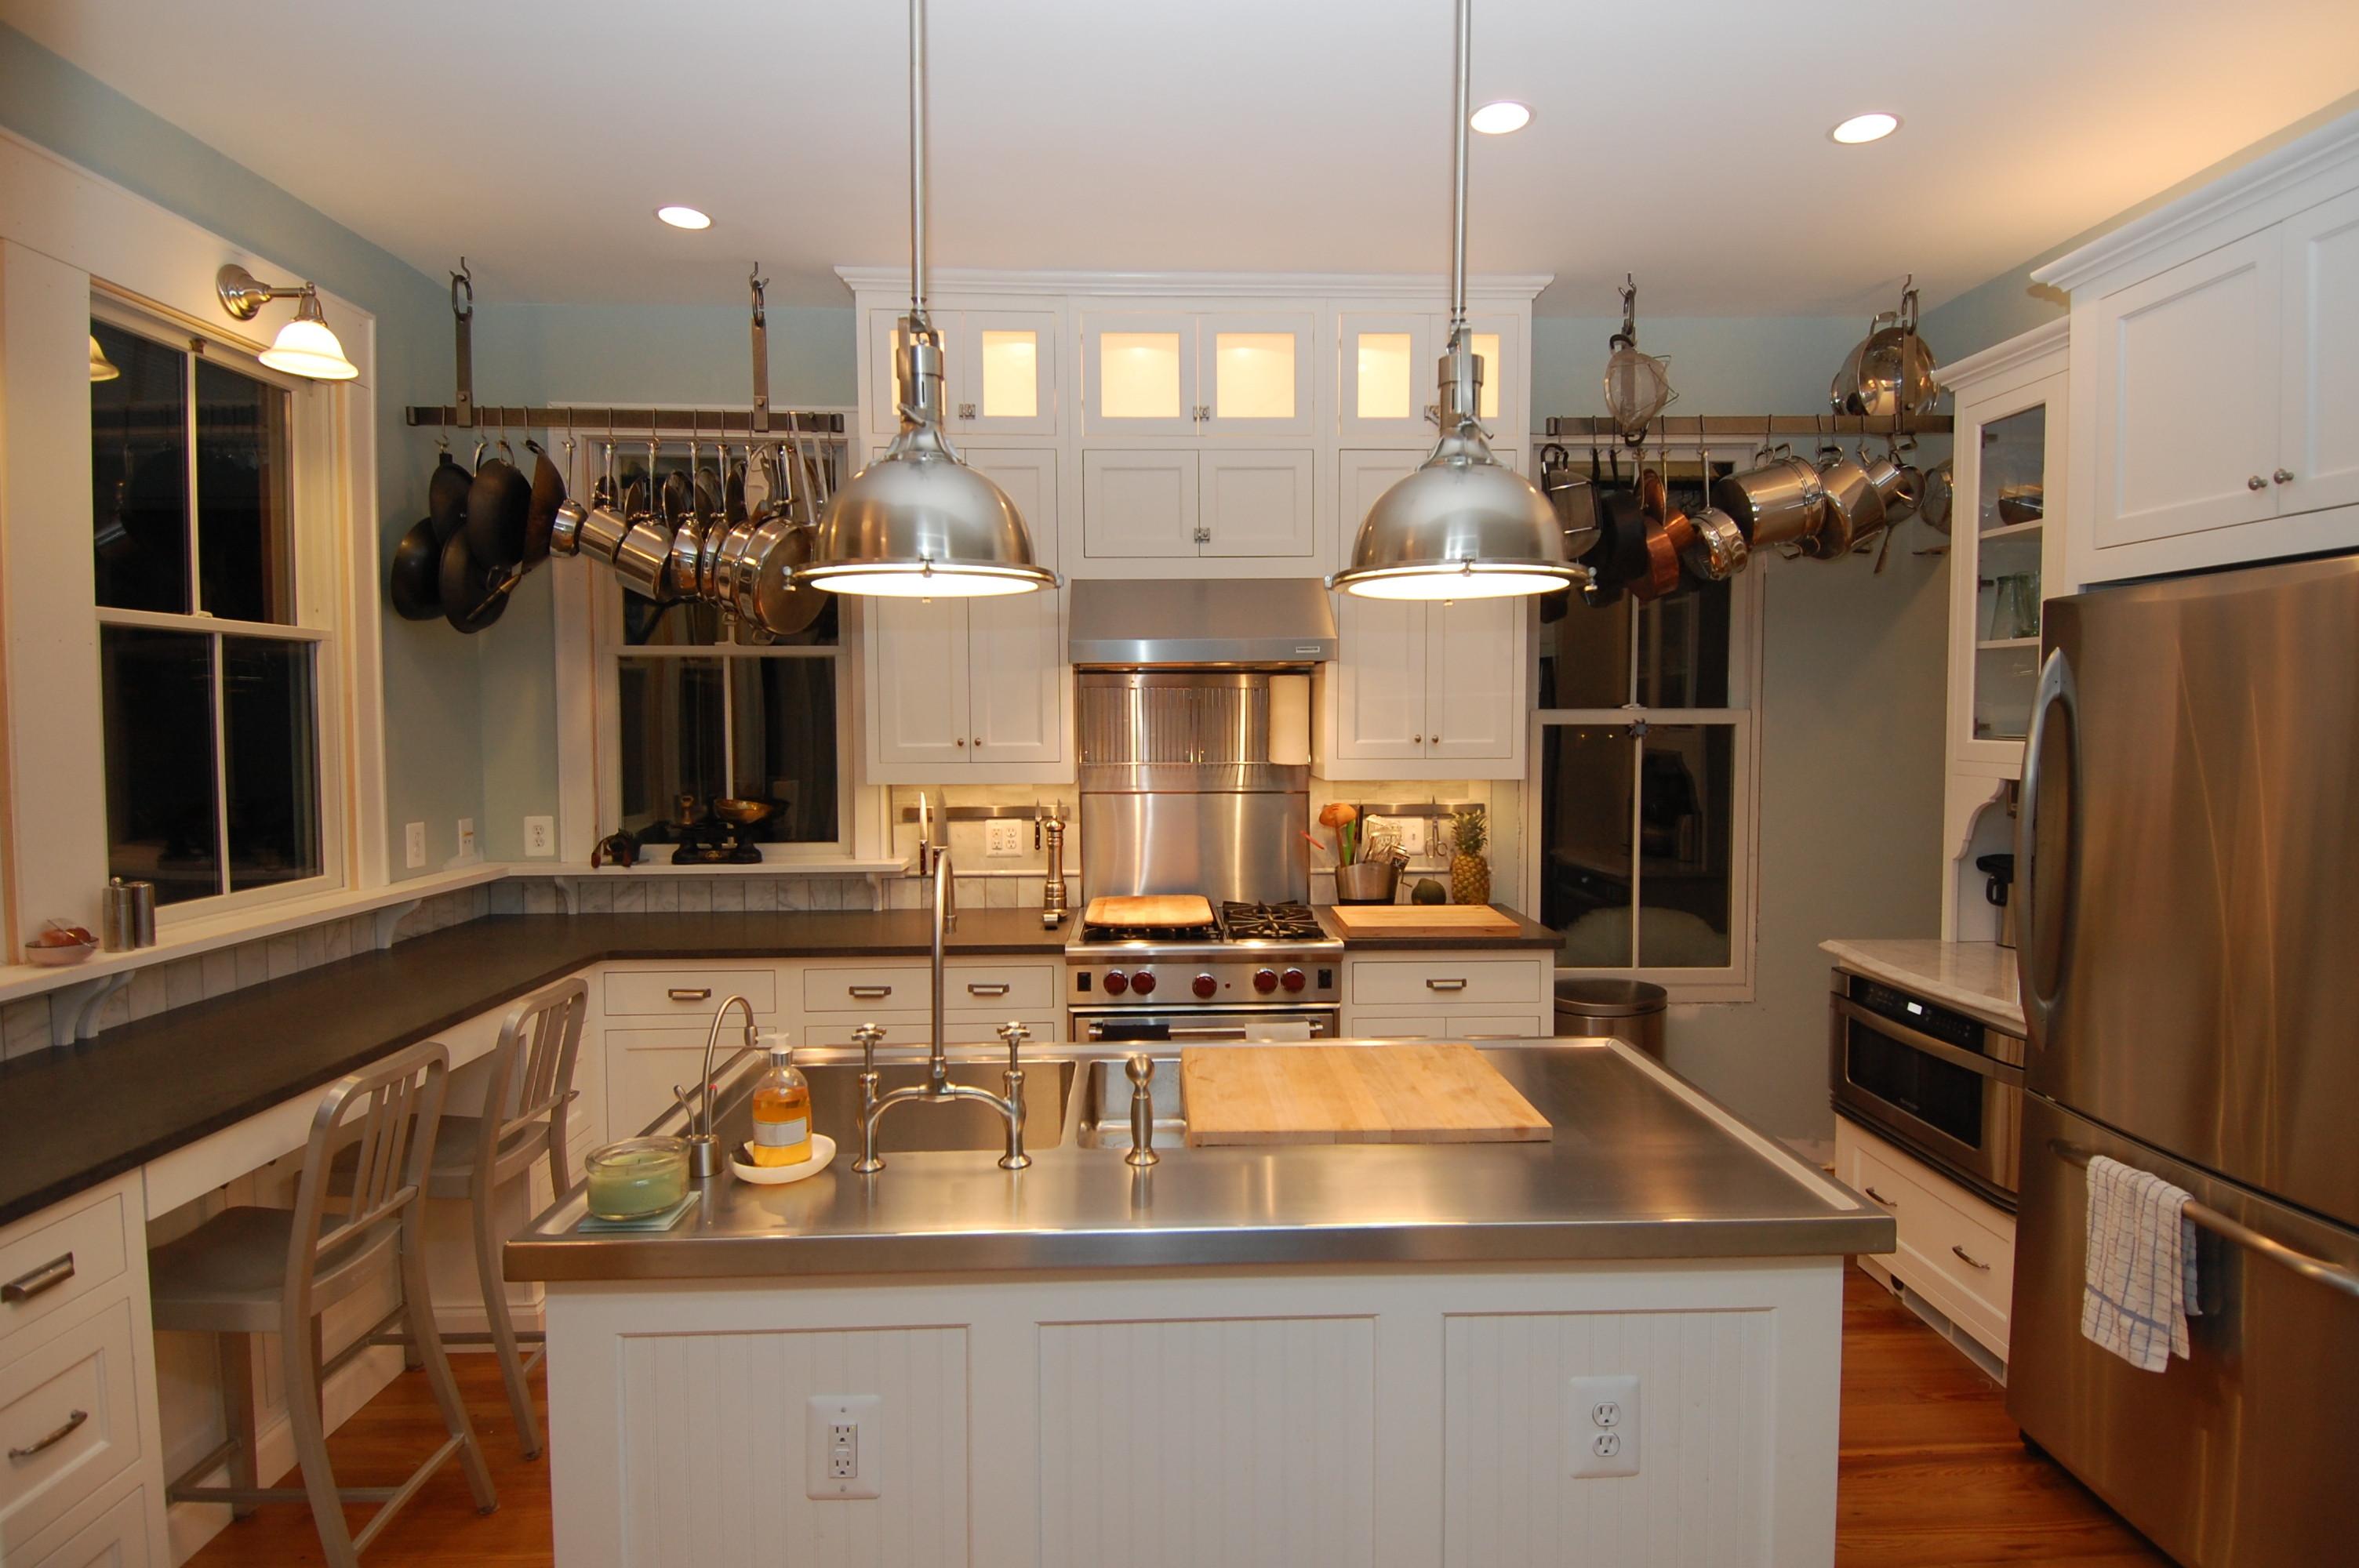 granite countertop alternatives n stainless steel kitchen countertops stainless countertop